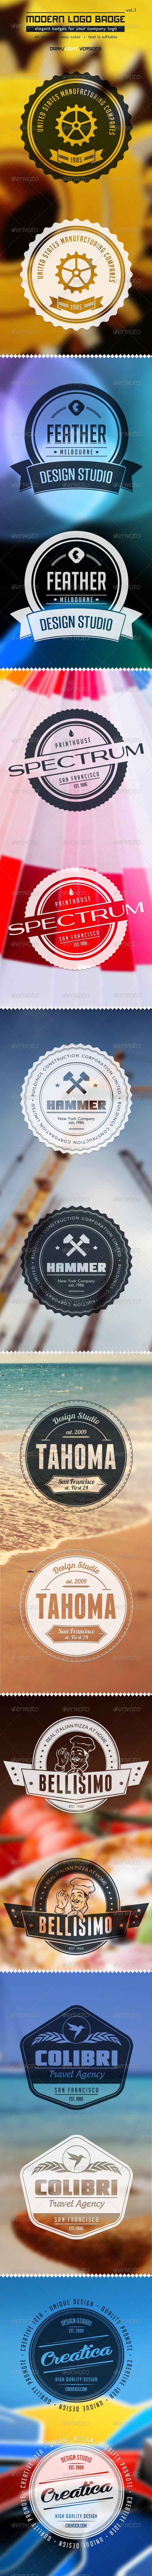 GraphicRiver Modern Logo Badge vol3 3759622